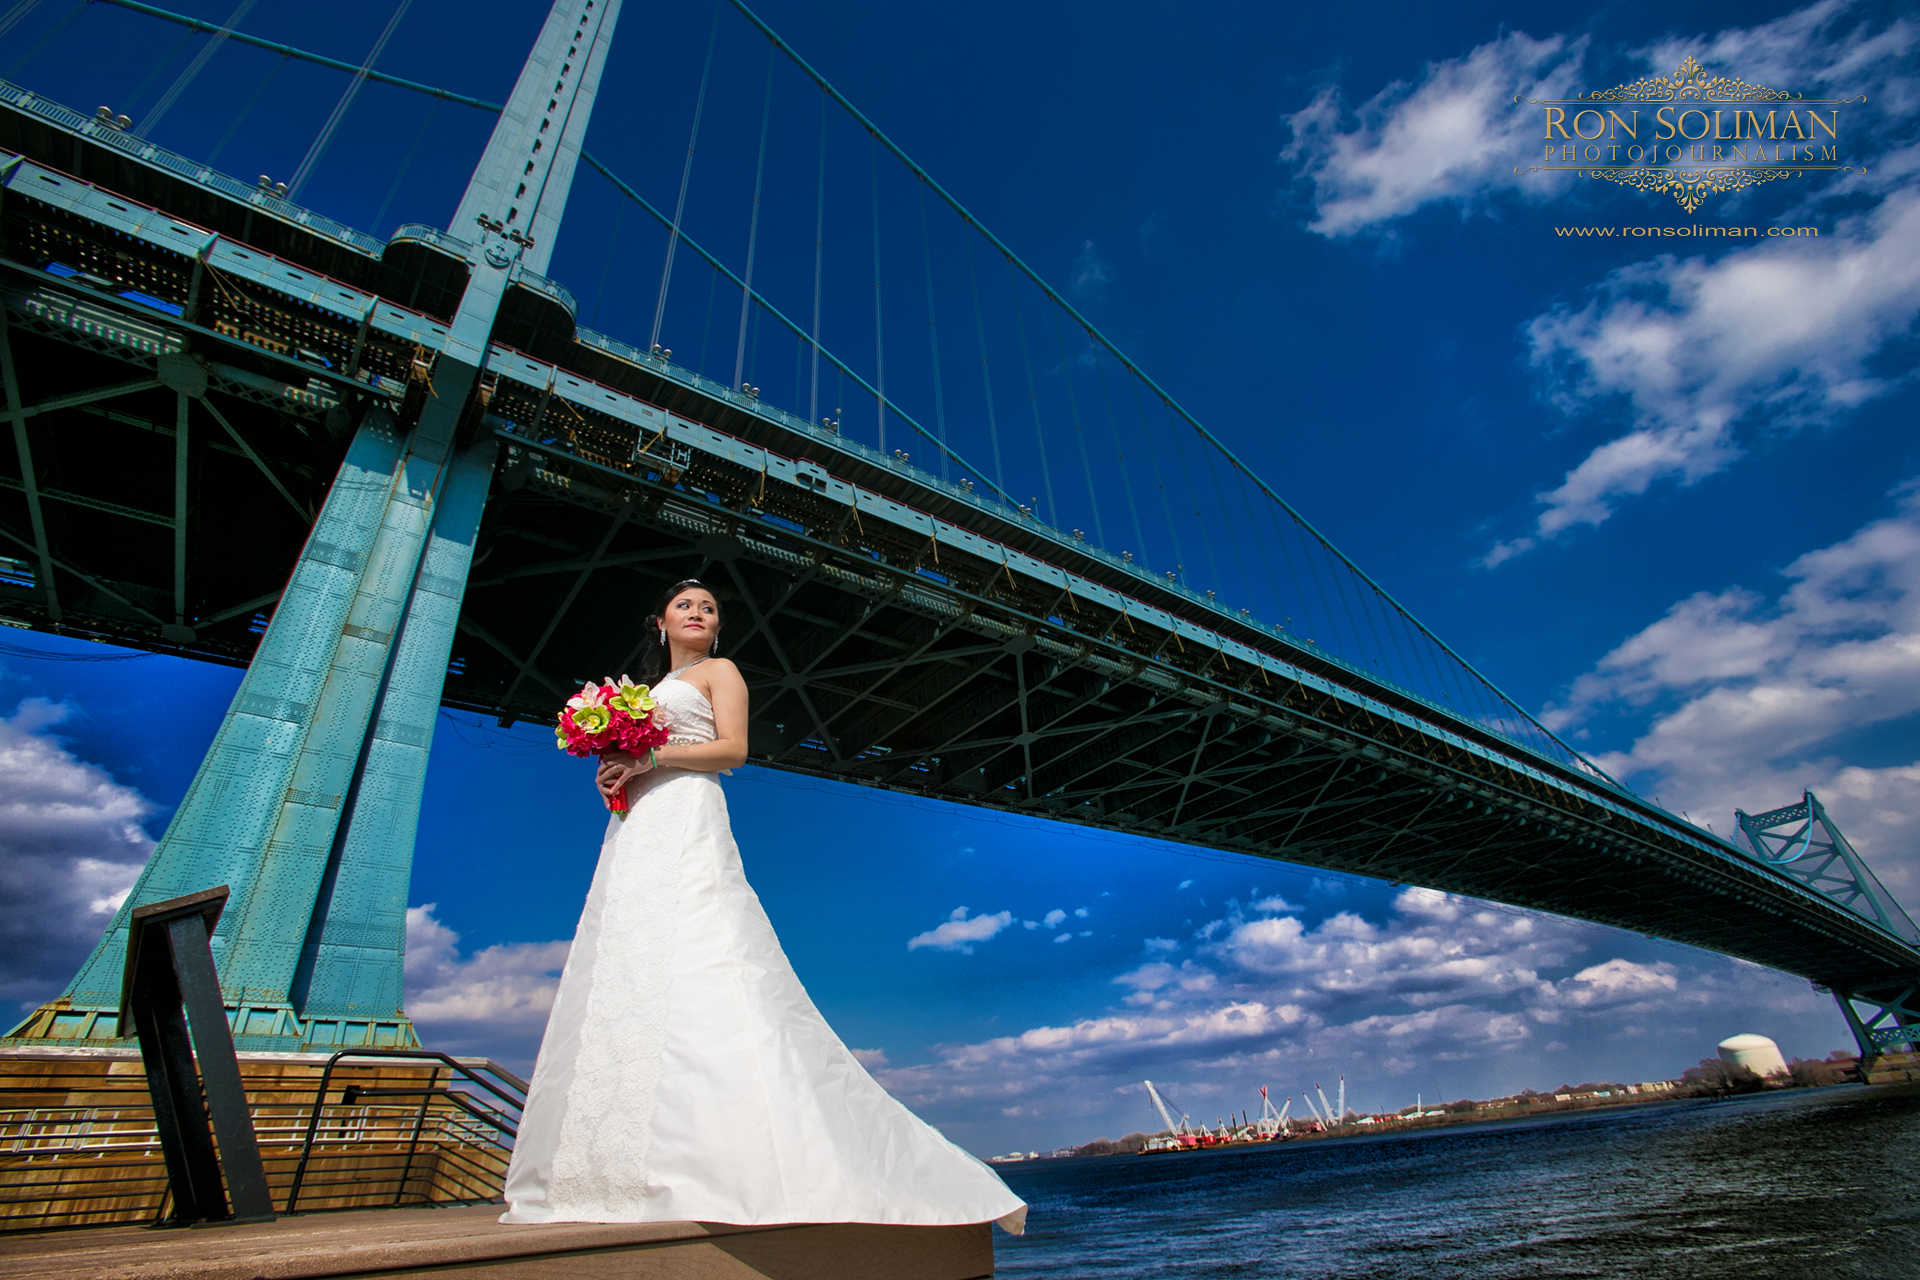 VIETNAMESE WEDDING 21